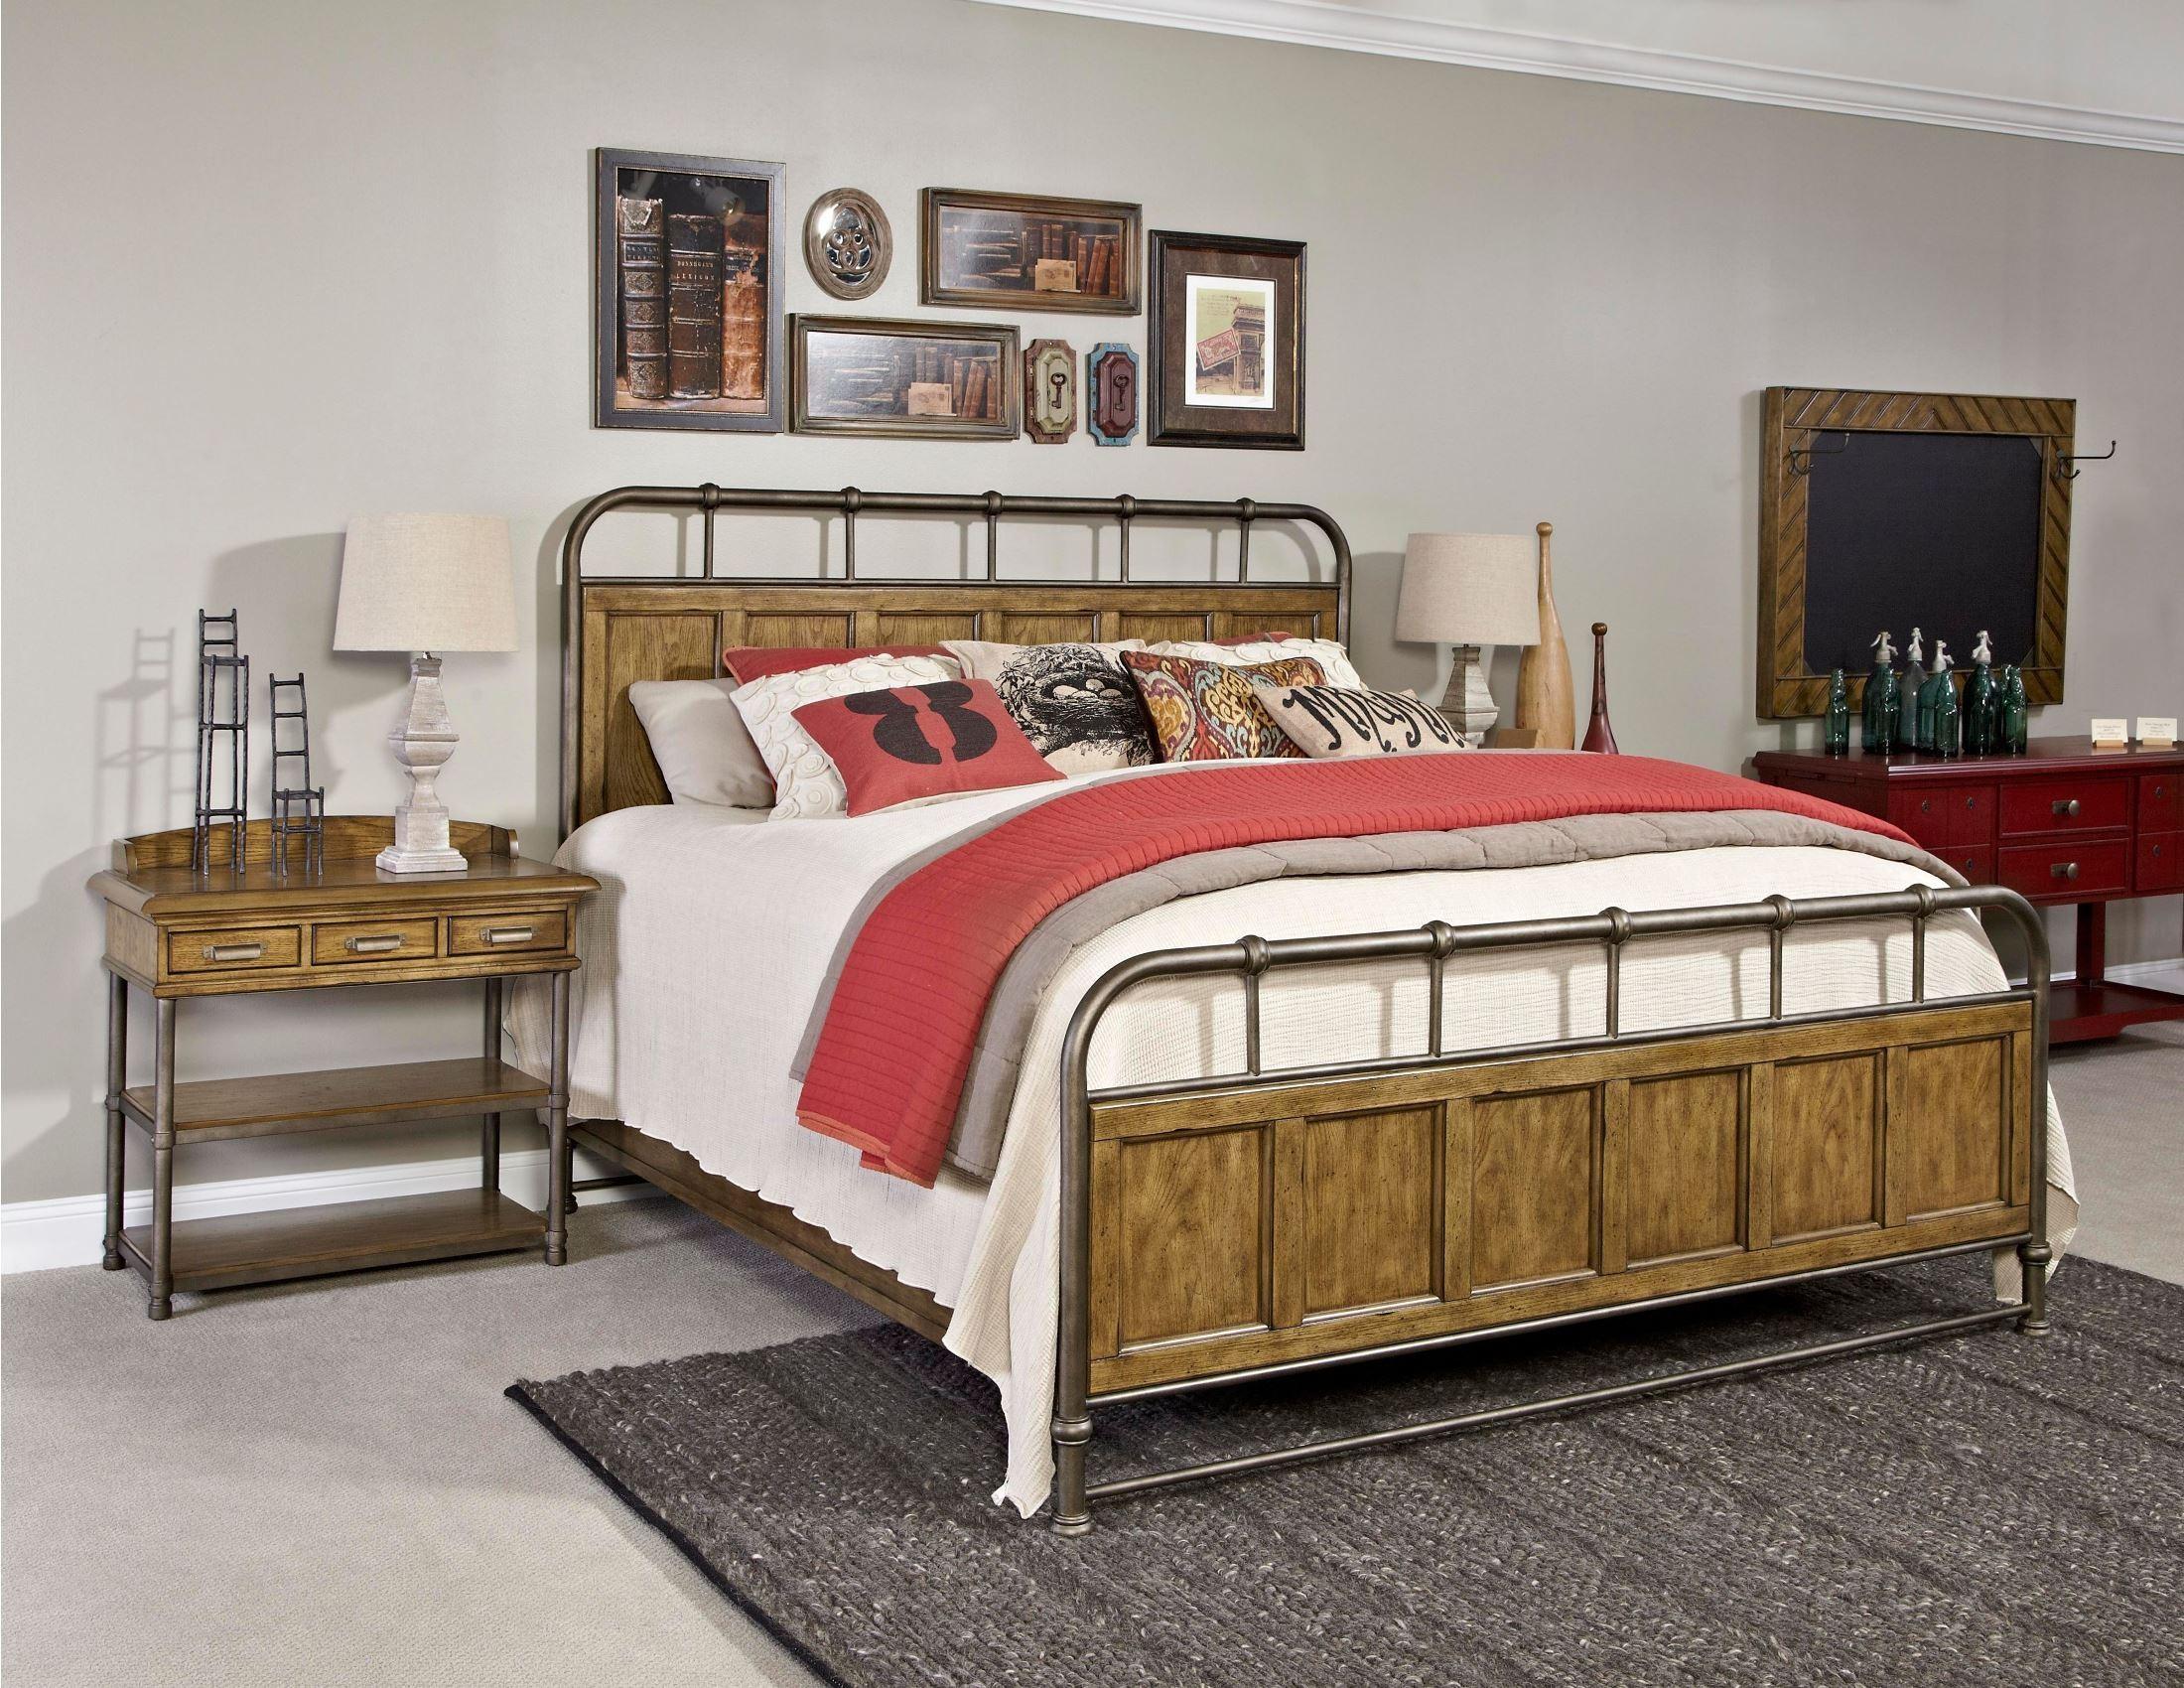 New Vintage Brown Metal Wood Bedstead Bedroom Set From Broyhill 4808 250 251 450 Coleman